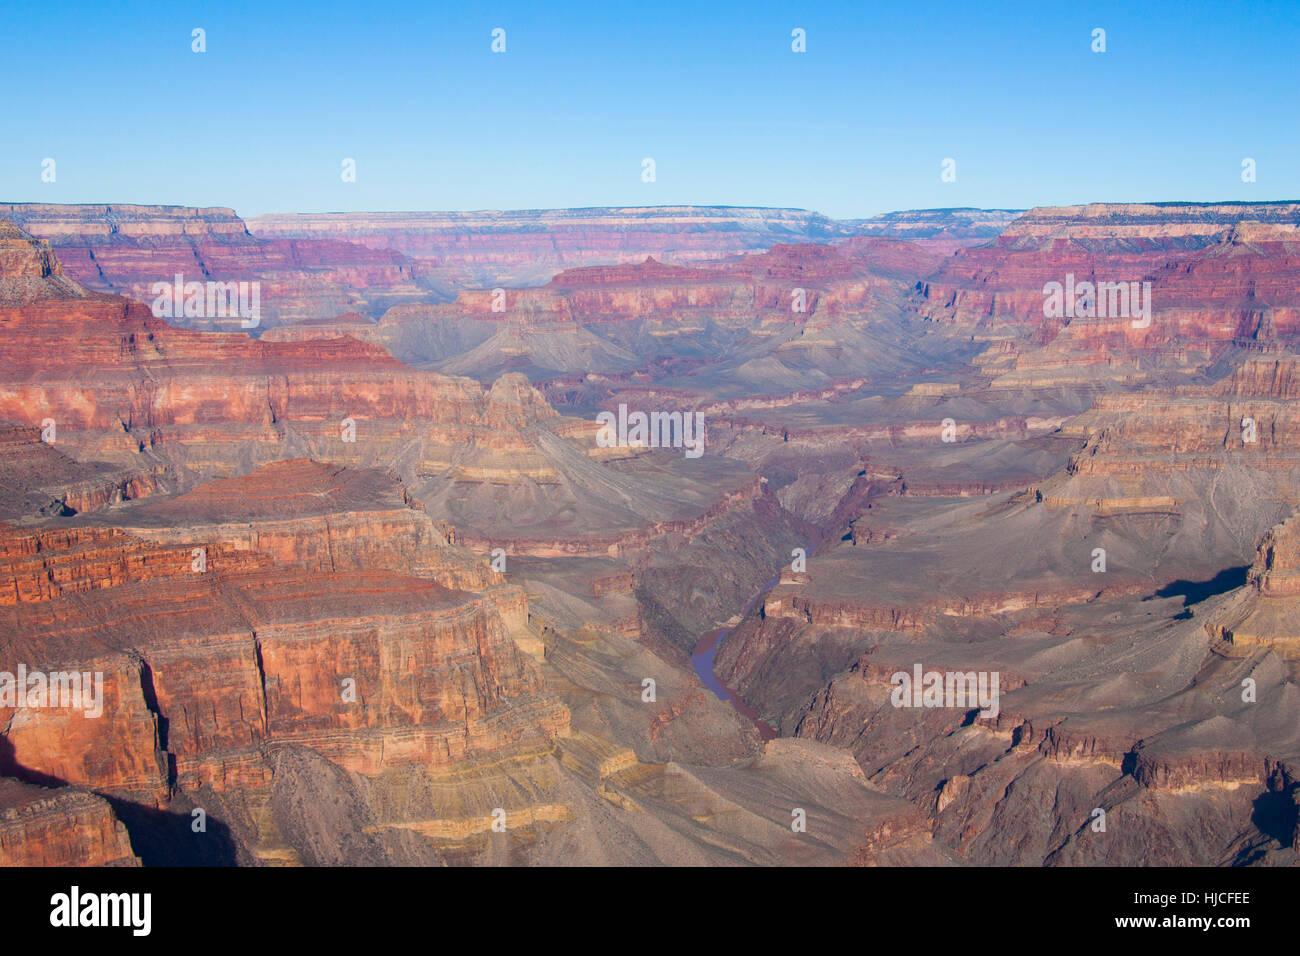 Rive Sud, le Parc National du Grand Canyon, UNESCO World Heritage Site, Arizona, USA Photo Stock